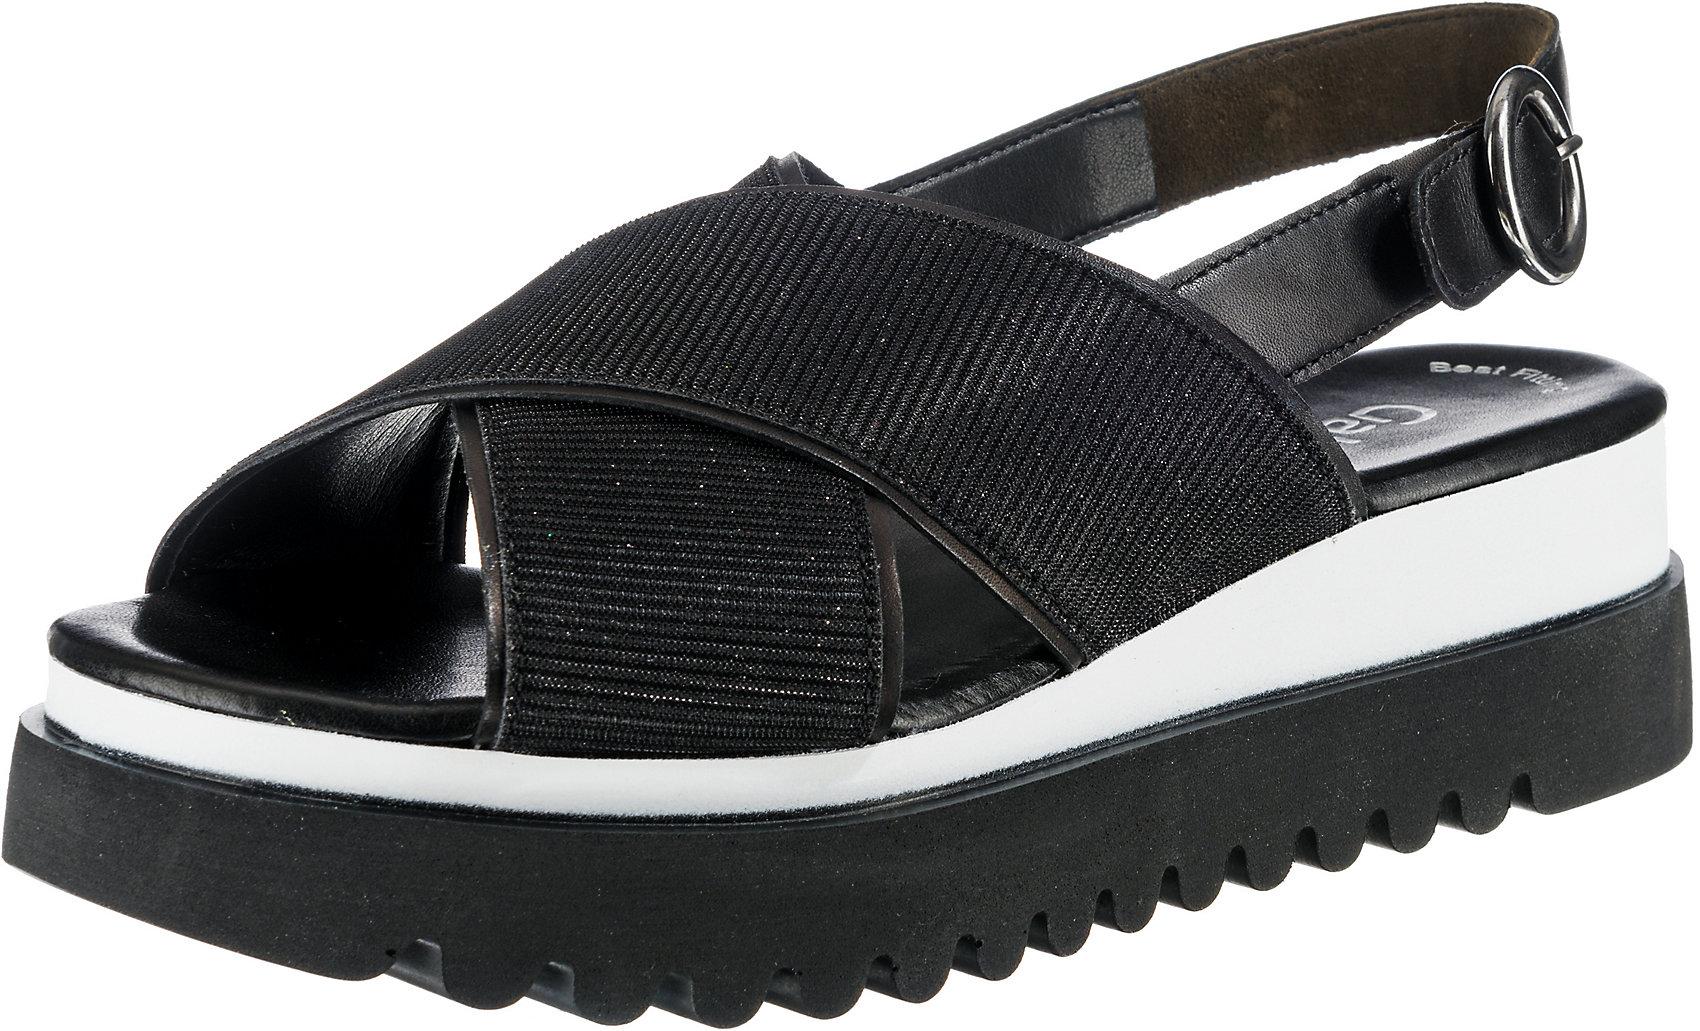 Sandaletten 7970117 Damen Für Plateau SchwarzEbay Gabor Neu 9I2DHEW